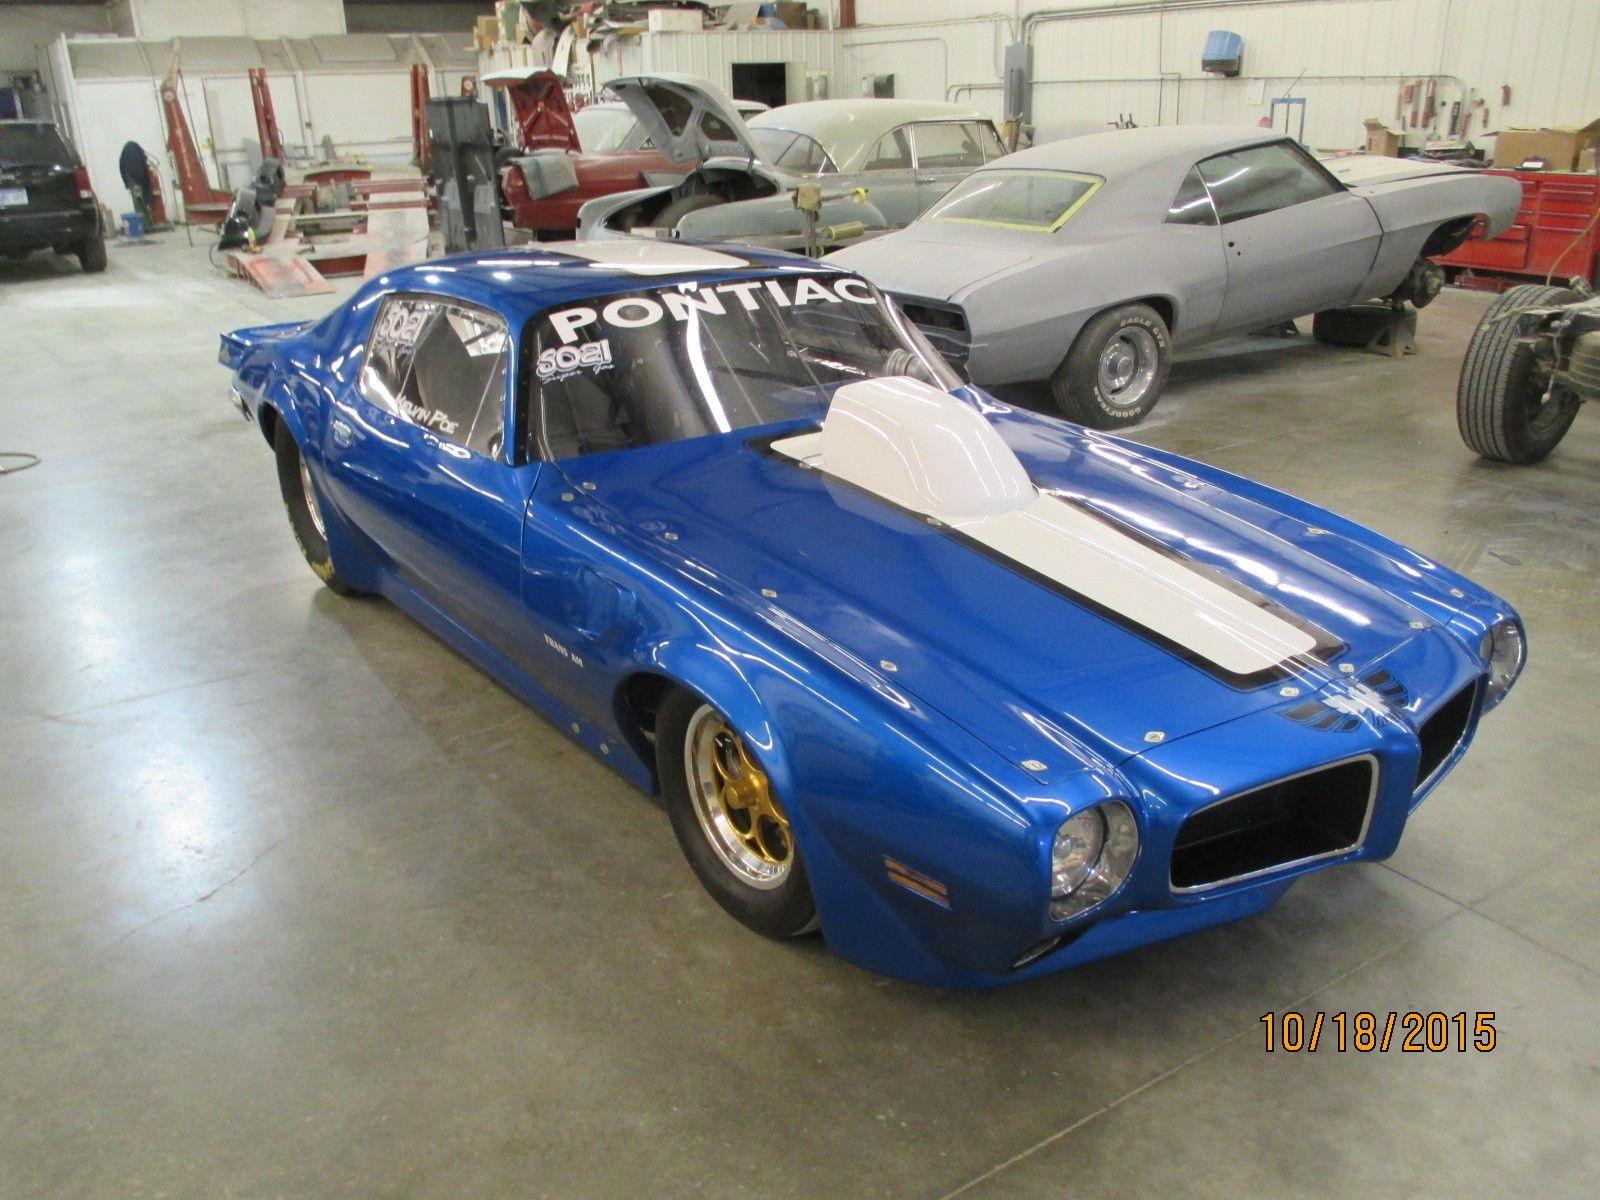 Http bangshift com wp content uploads 2015 11 1970 pontiac trans am tube chassis drag car 3 jpg go pro street or no street pinterest firebird